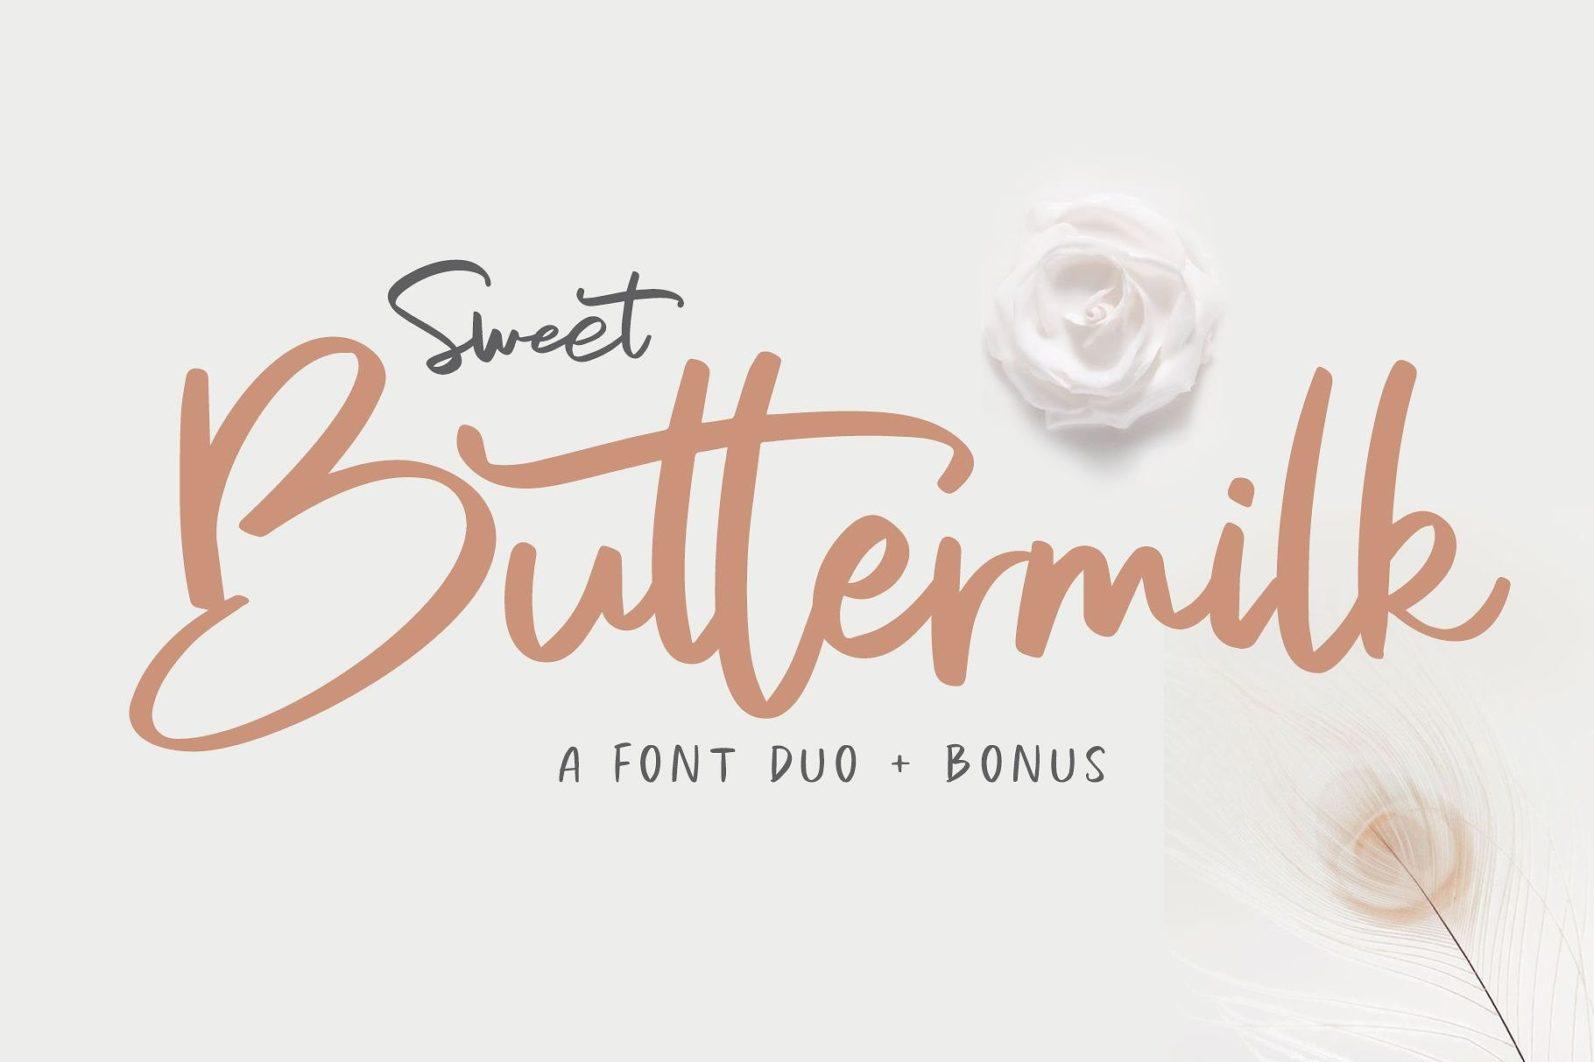 Sweet Buttermilk - Font Duo + Bonus - 001 21 -